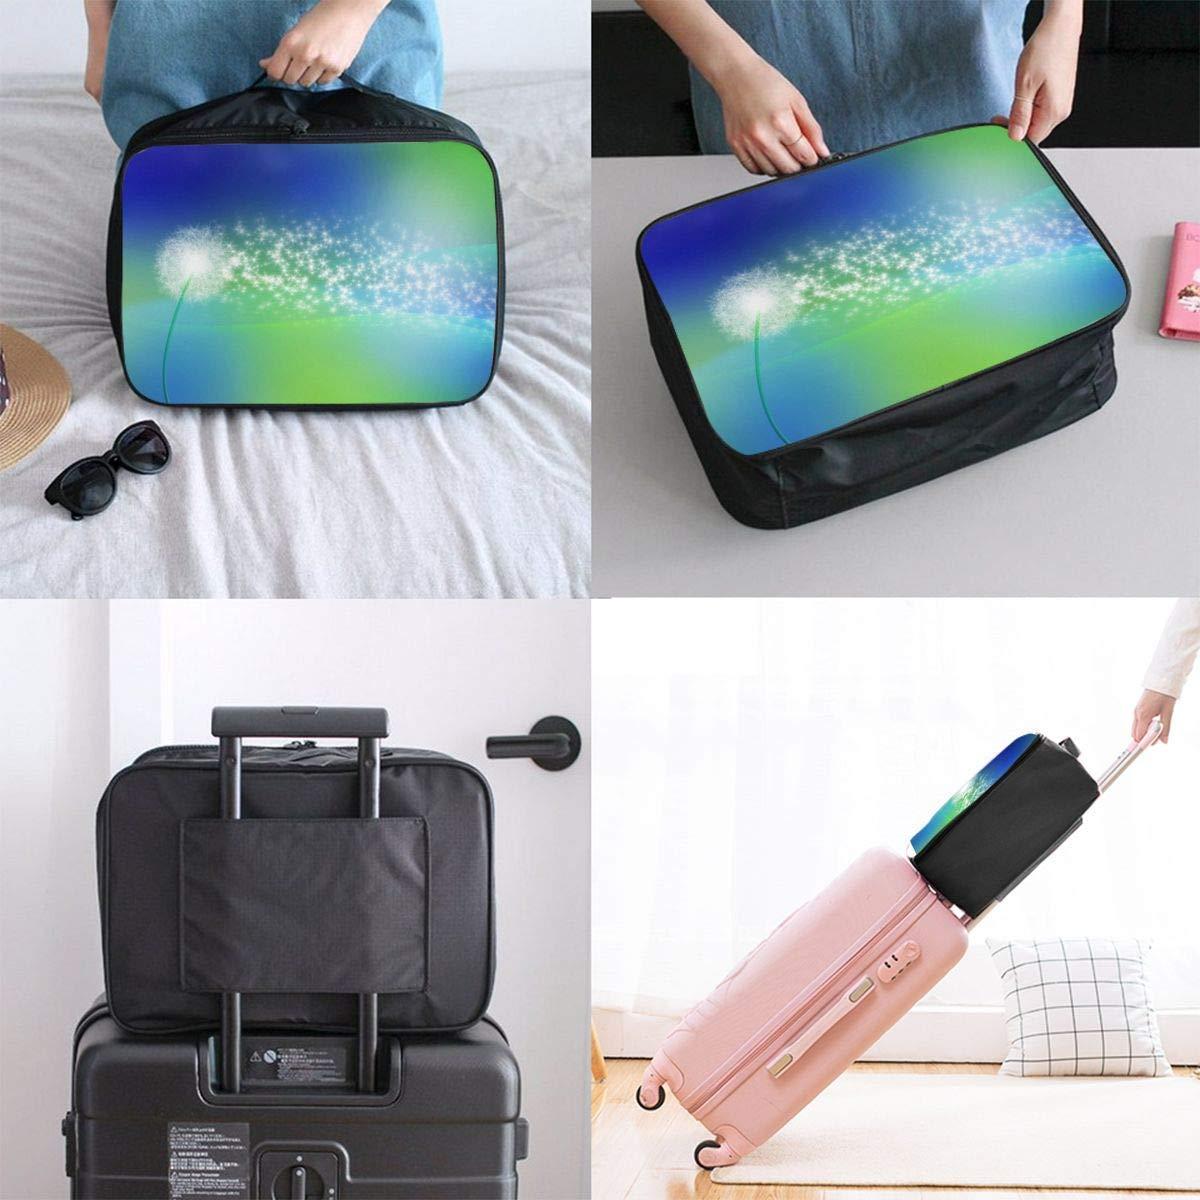 JTRVW Luggage Bags for Travel Lightweight Large Capacity Portable Duffel Bag for Men /& Women White Dandelion Travel Duffel Bag Backpack